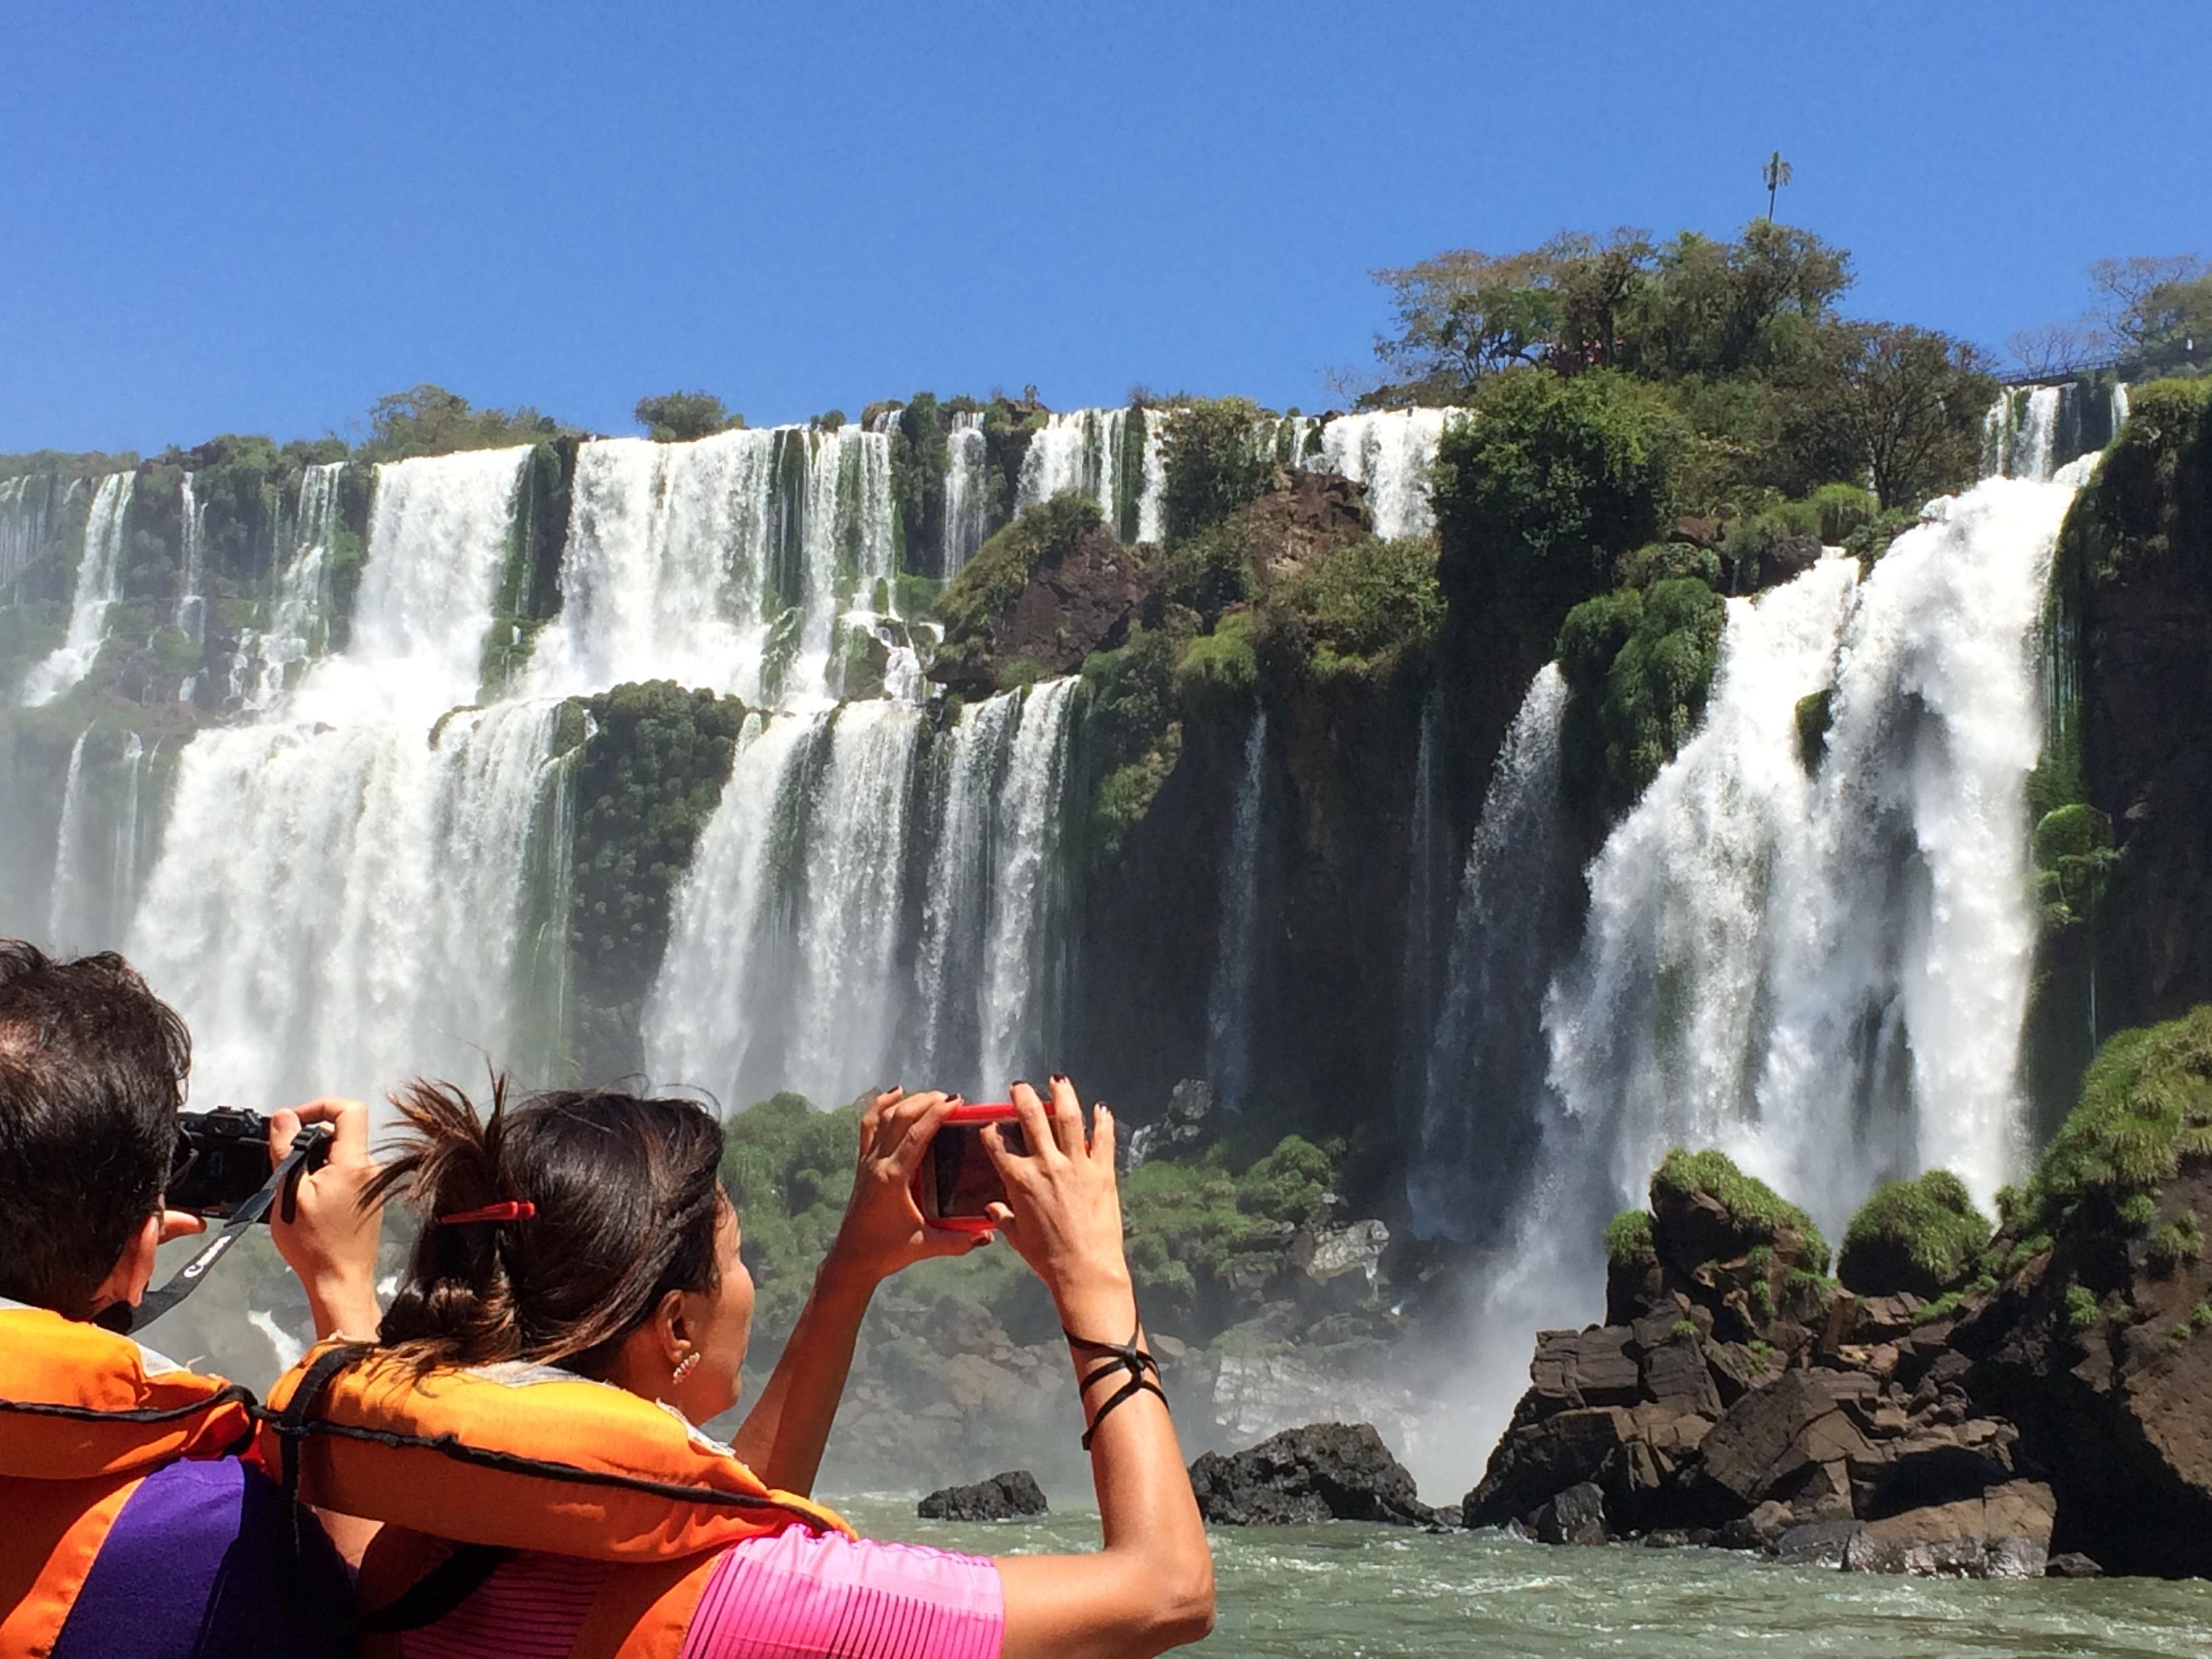 img_1996 Incredible Iguazú Falls Argentina